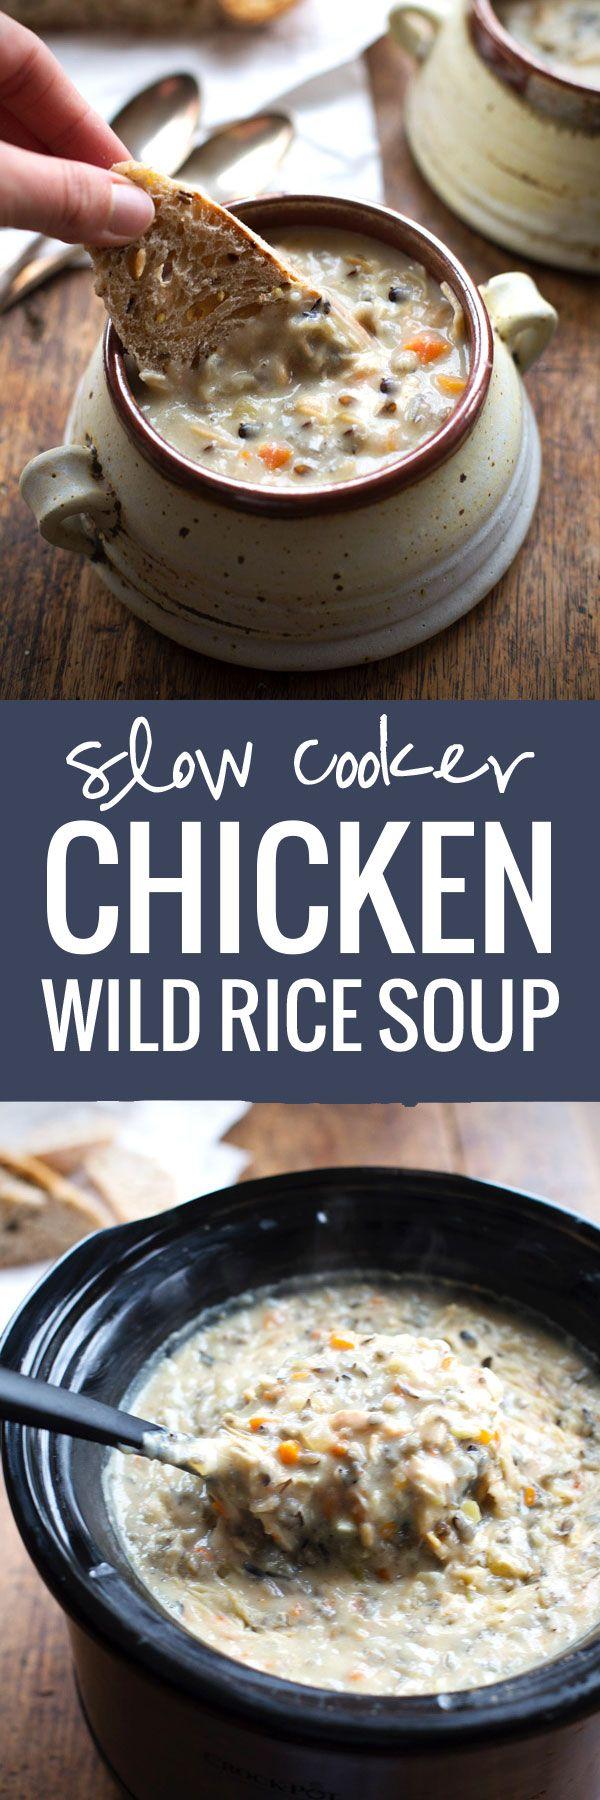 Crockpot Chicken Wild Rice Soup Pinch Of Yum Recipe Homemade Soup Recipes Cooker Recipes